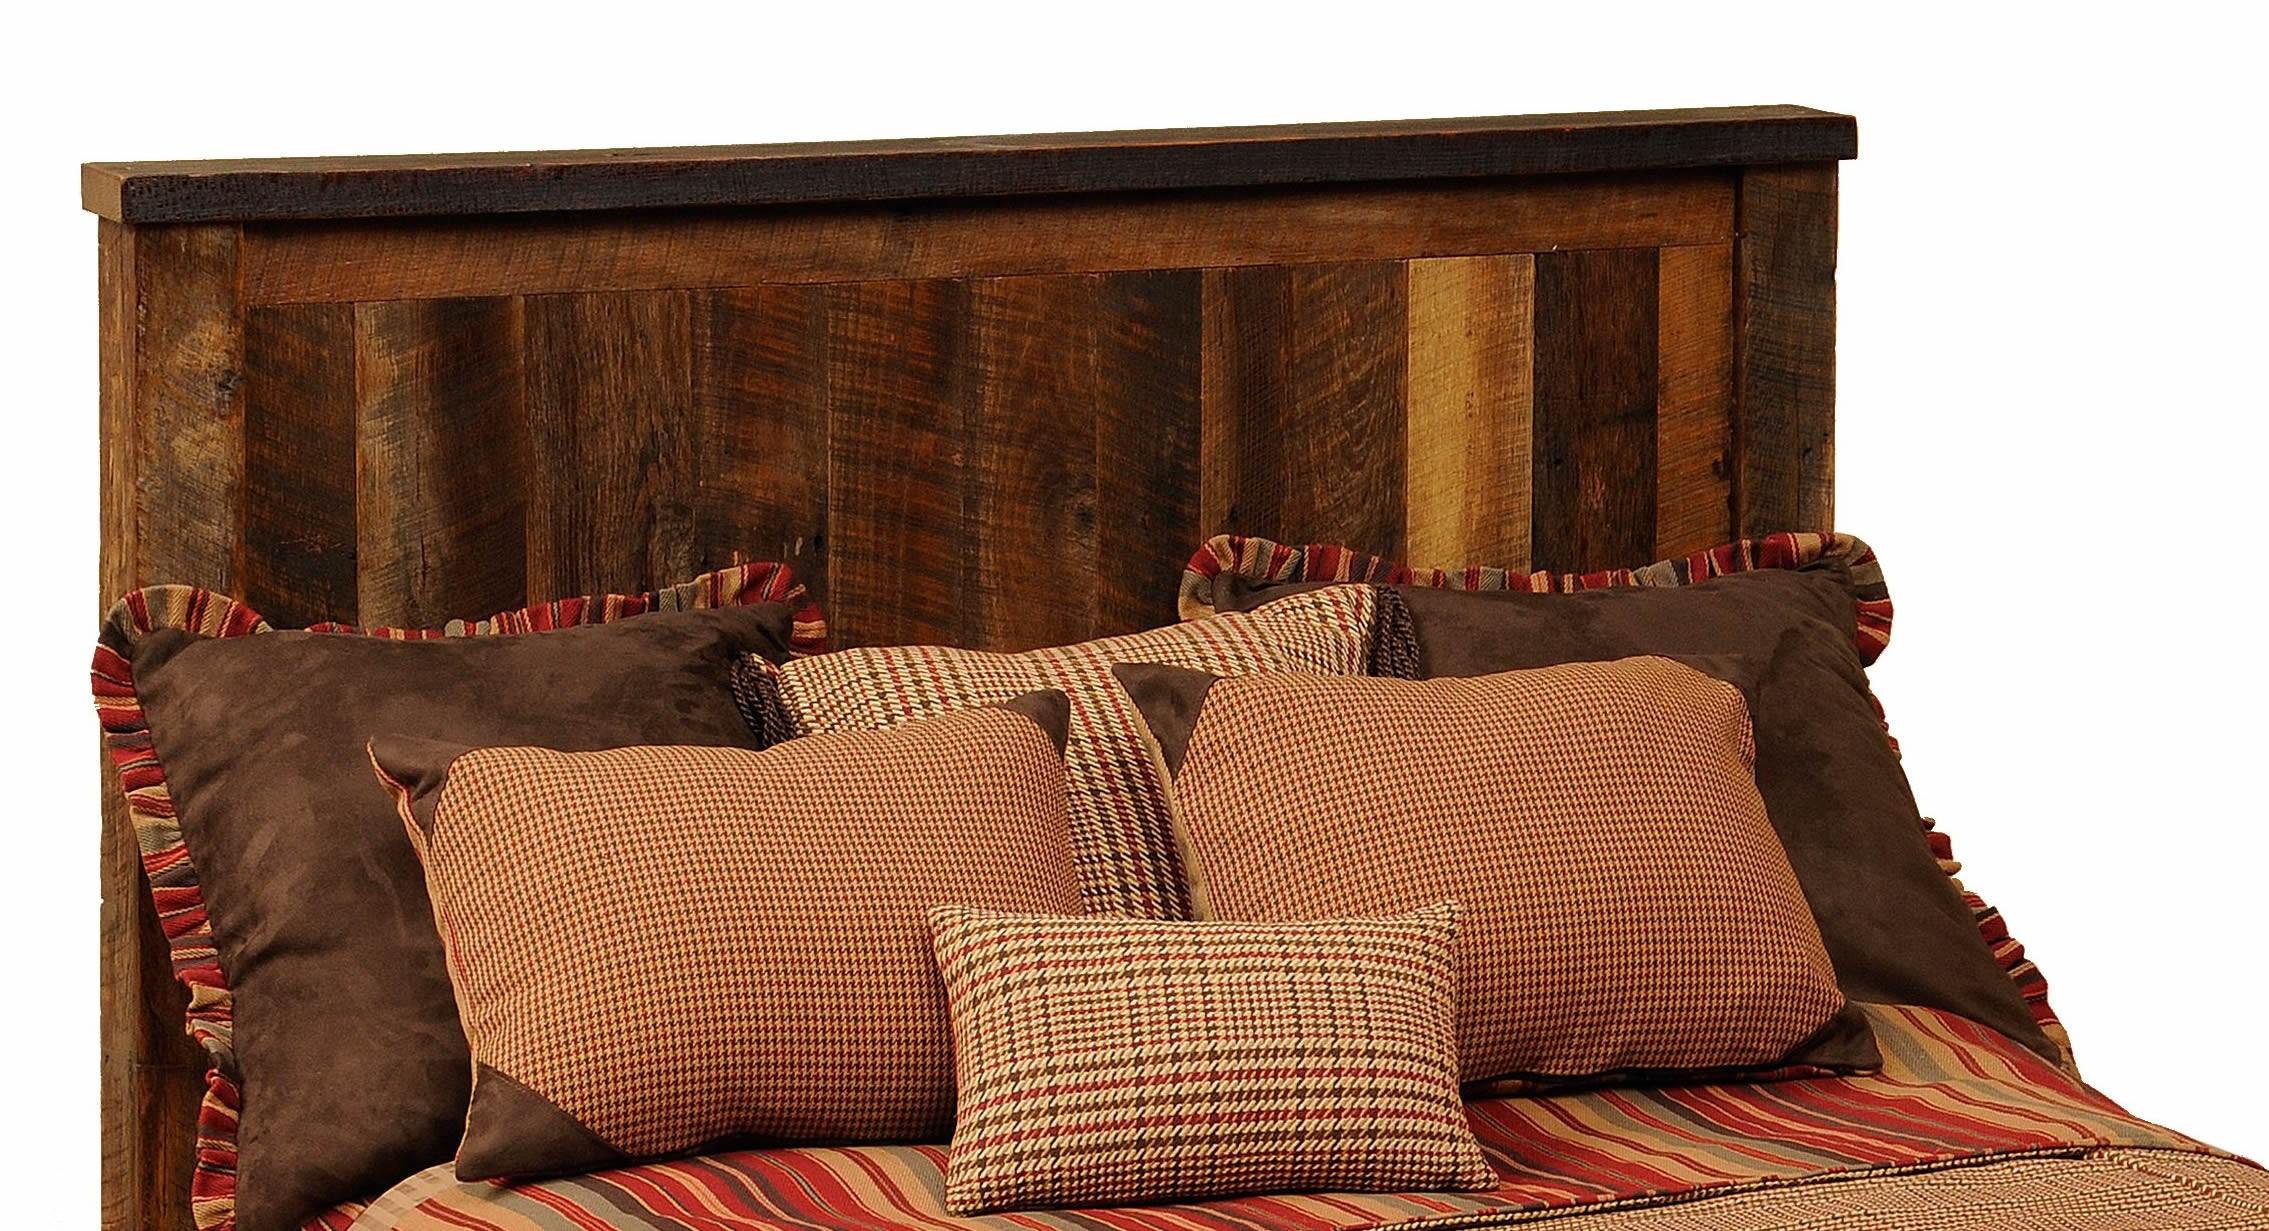 Barnwood Cal King Headboard From Fireside Lodge B10020